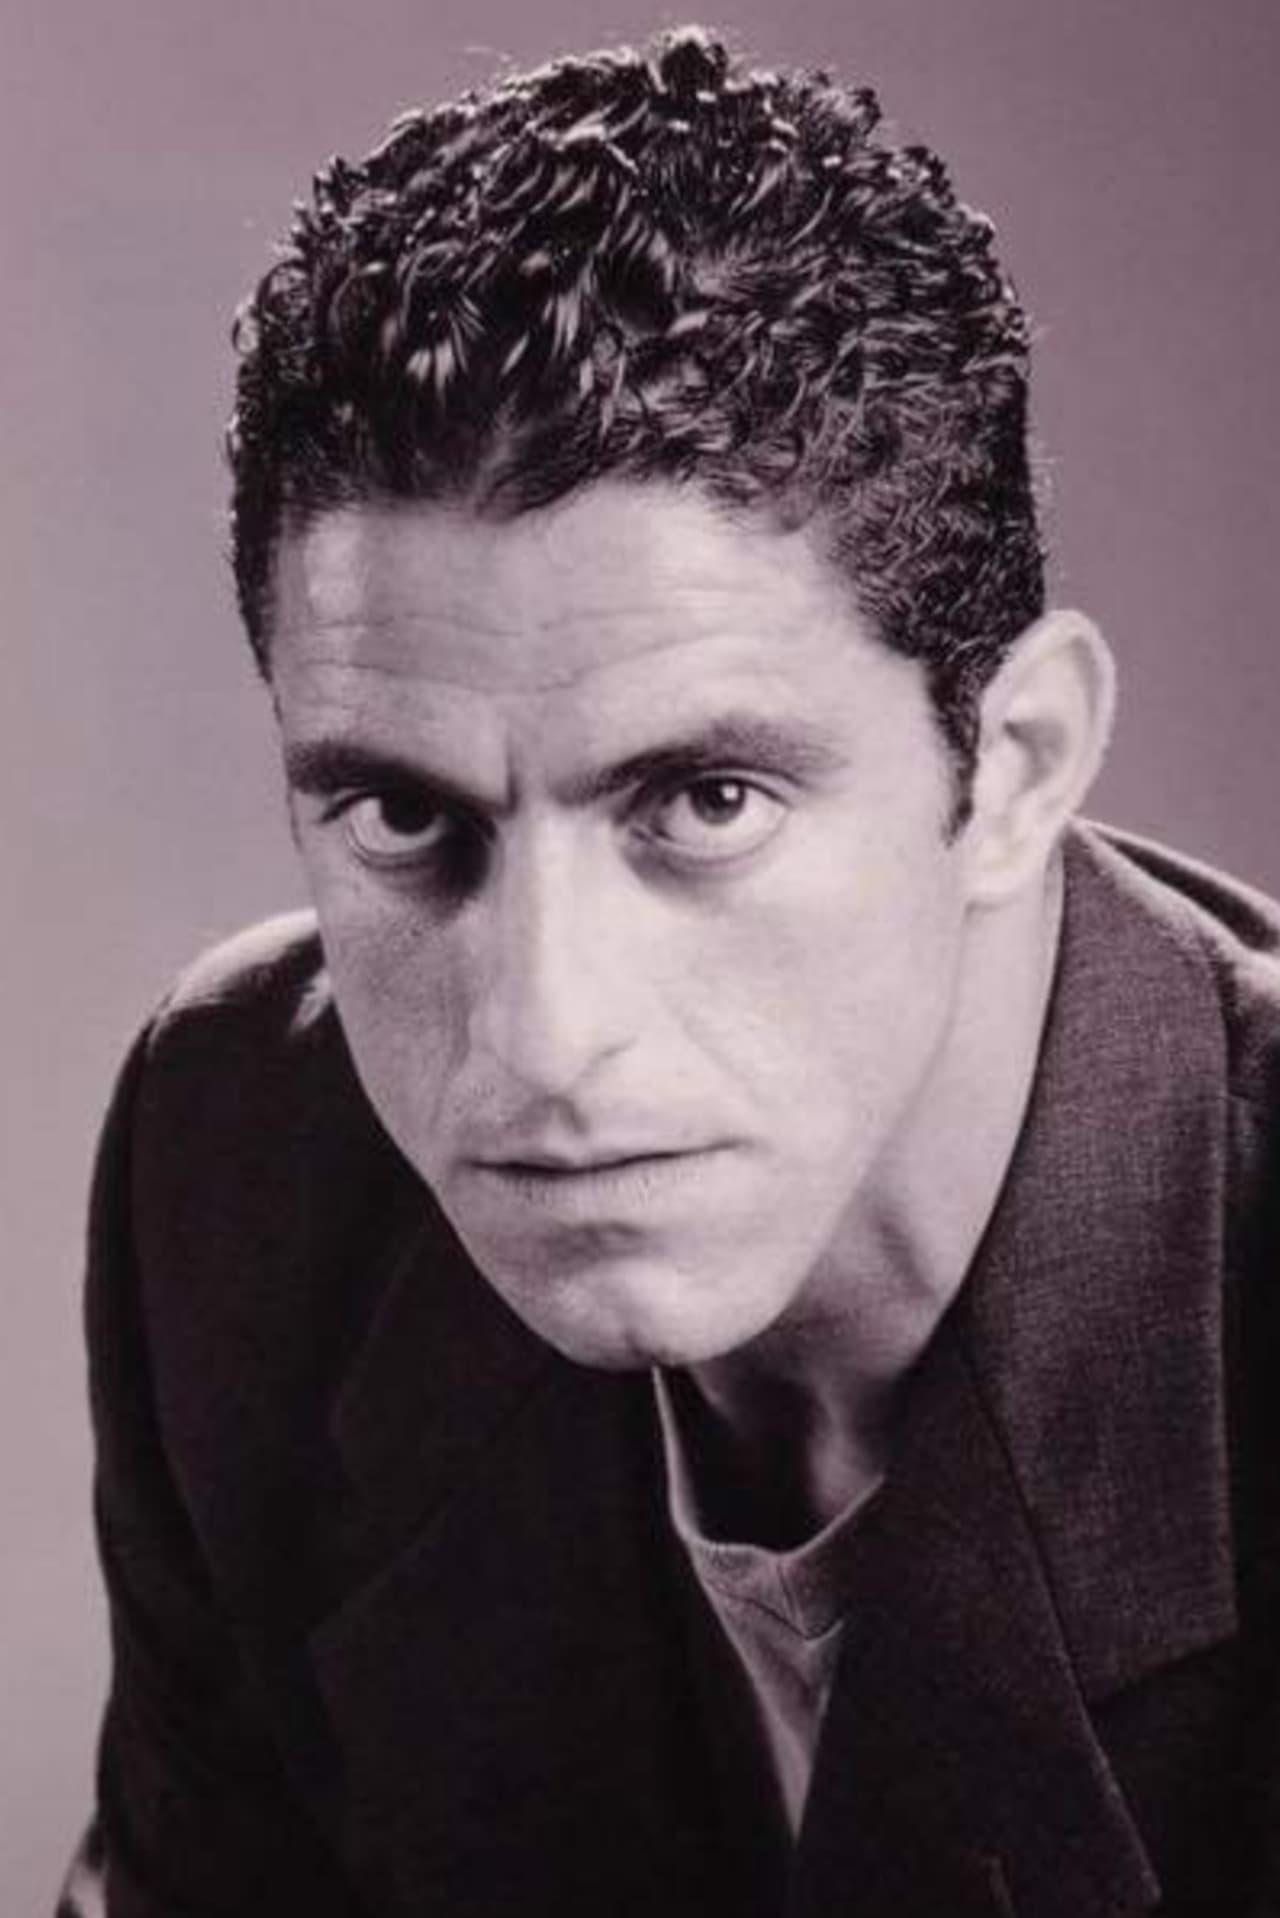 Alessandro Borgese